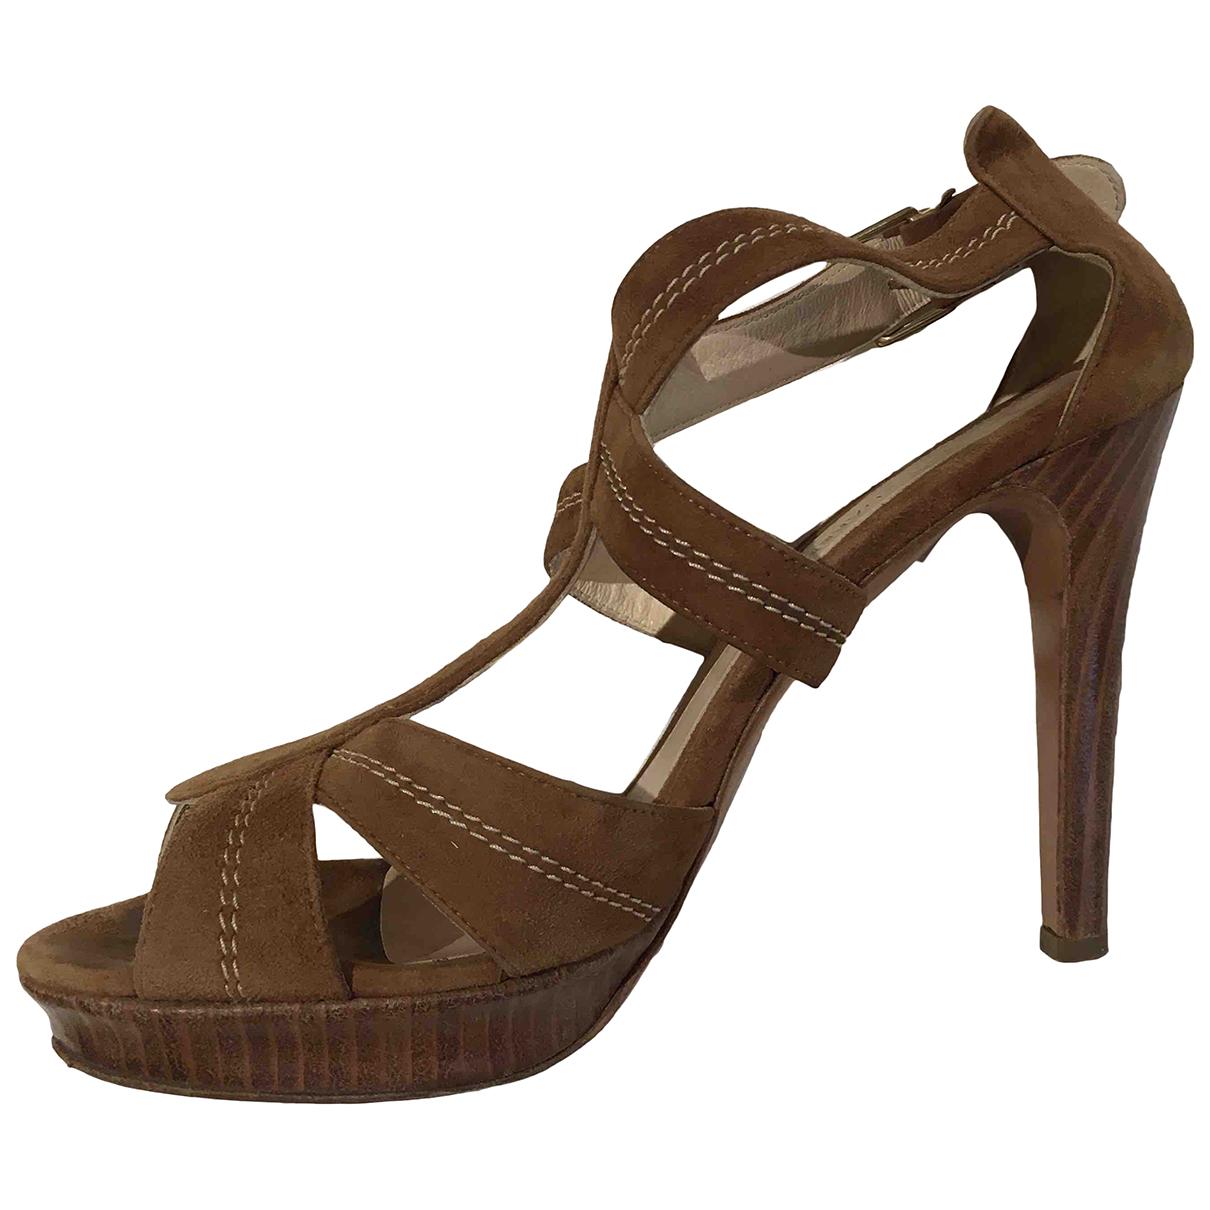 Gerard Darel N Camel Suede Sandals for Women 41 EU